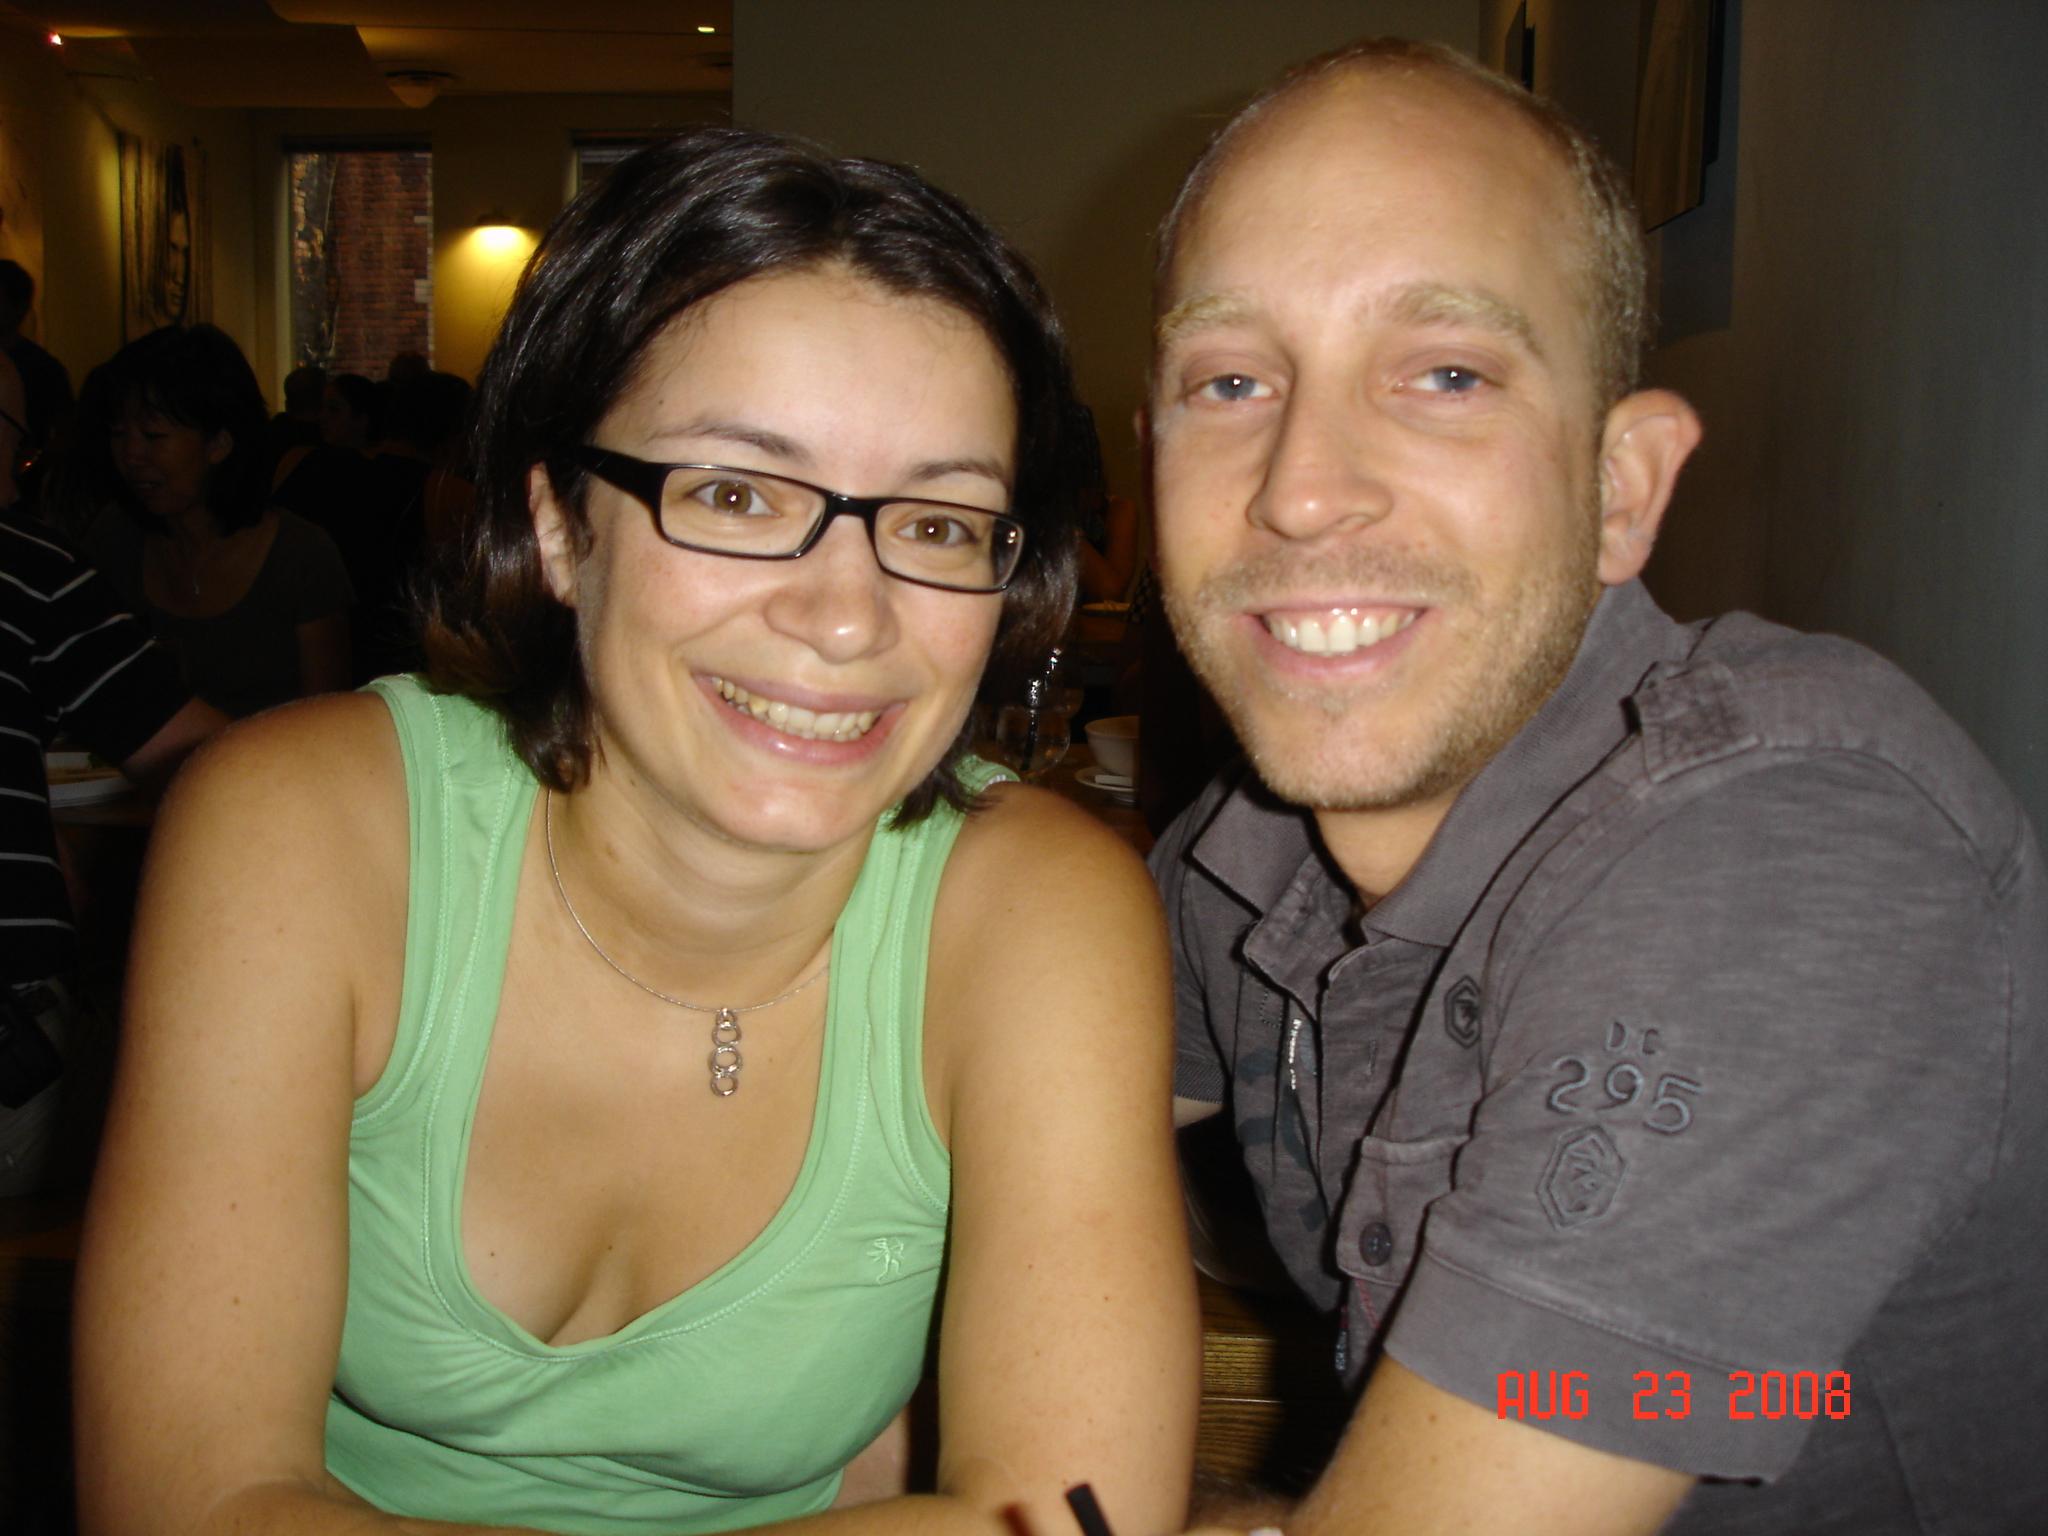 Carole and Steve